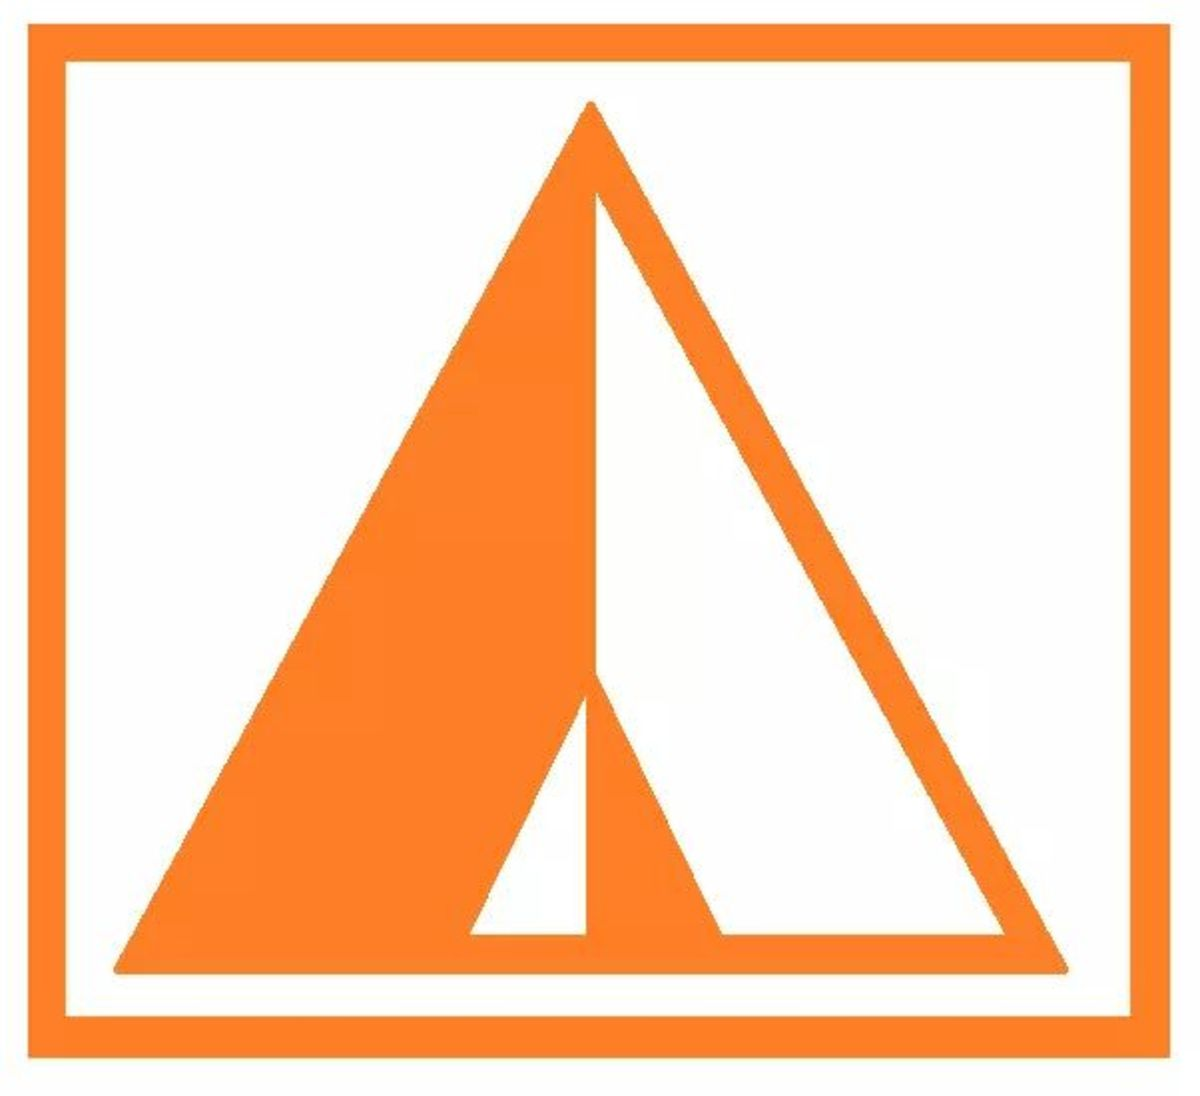 Credits to Radio Wigwam for their logo.